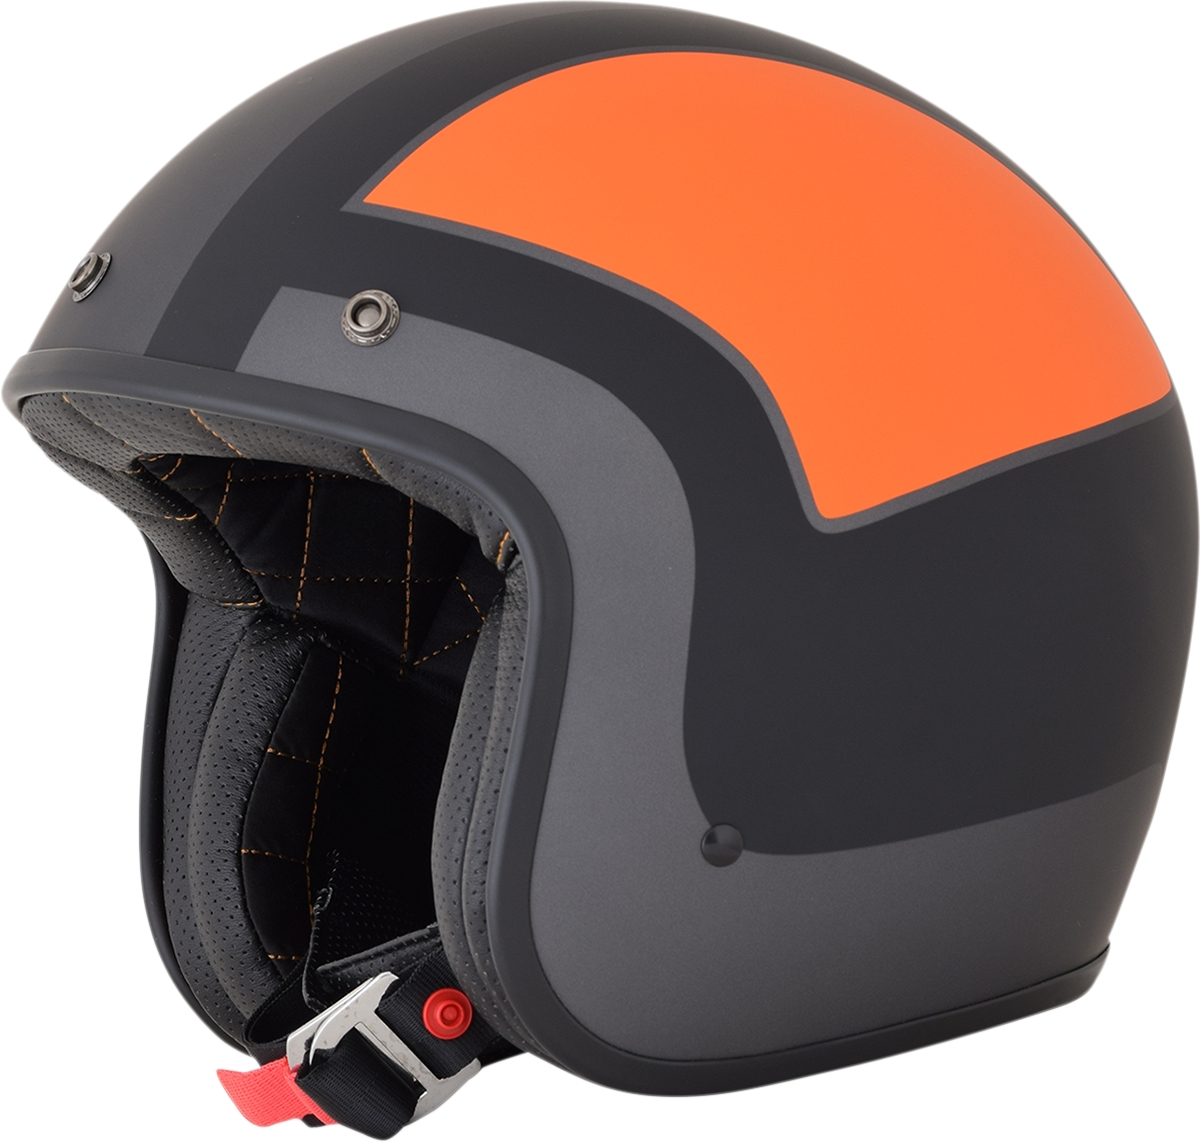 FX-76 Trilcolor Open Face Helmet